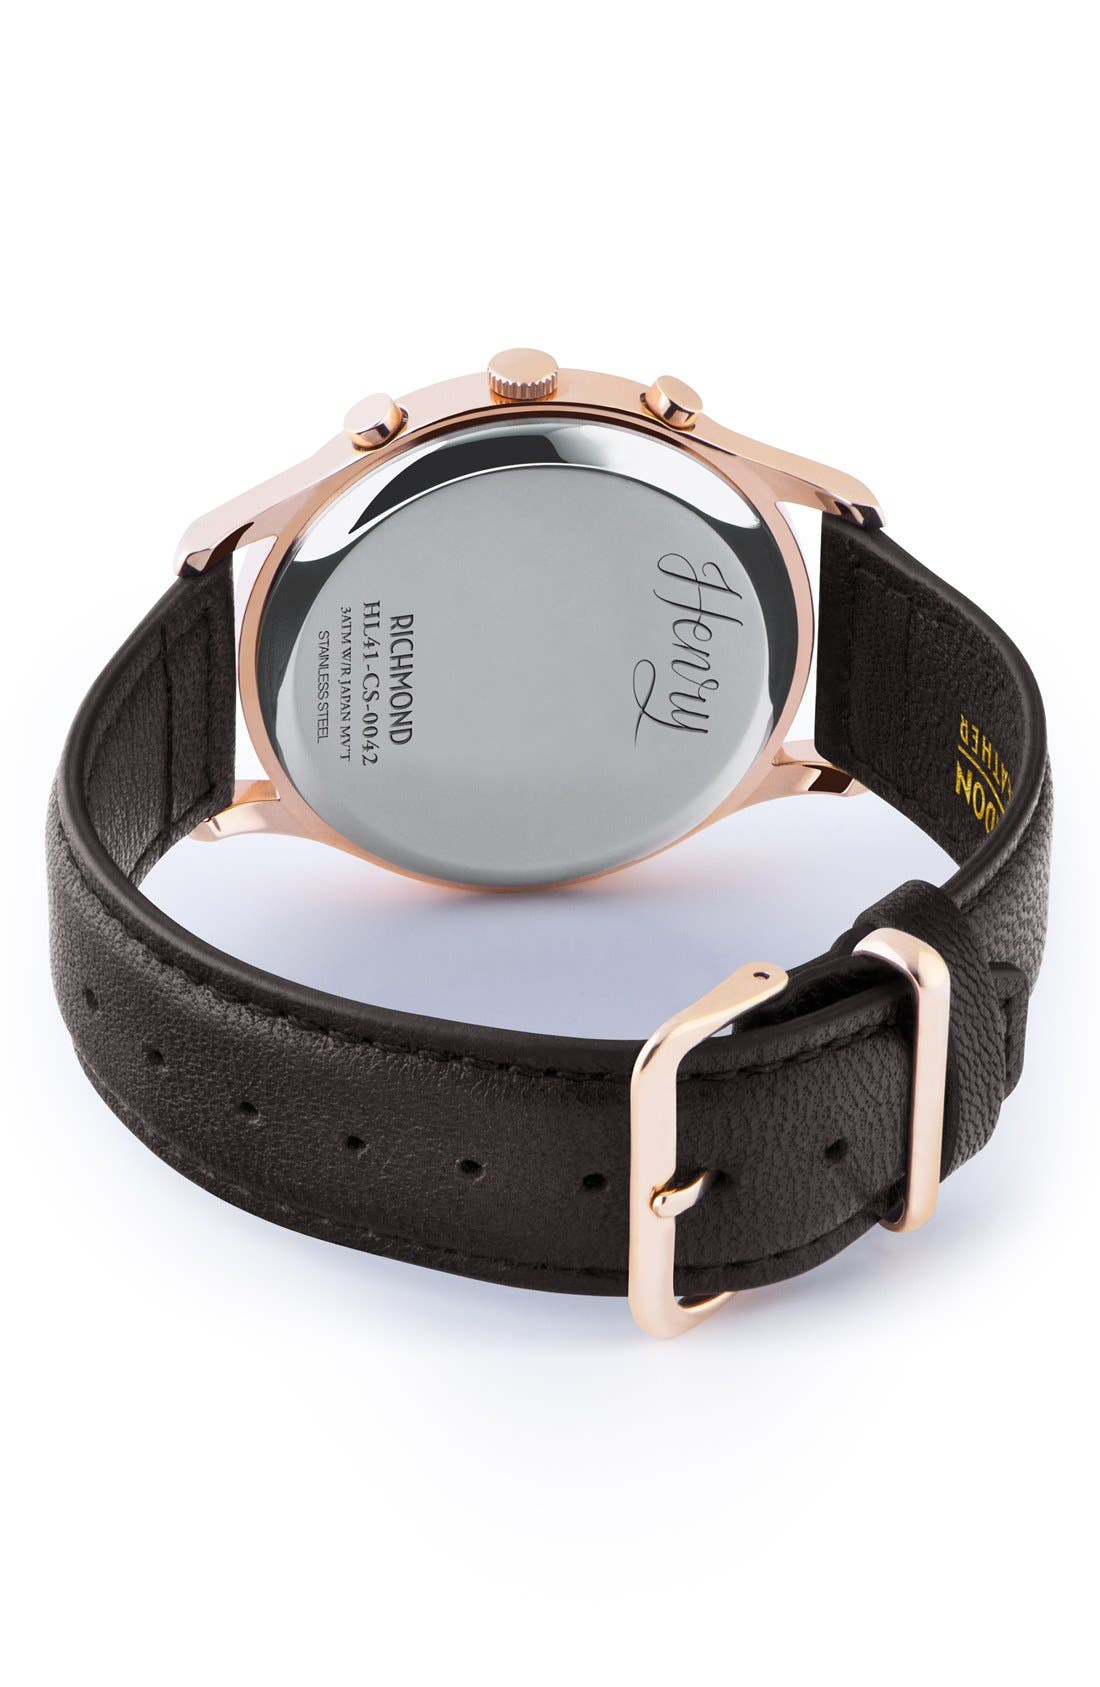 'Richmond' Chronograph Leather Strap Watch, 41mm,                             Alternate thumbnail 3, color,                             Black/ Black